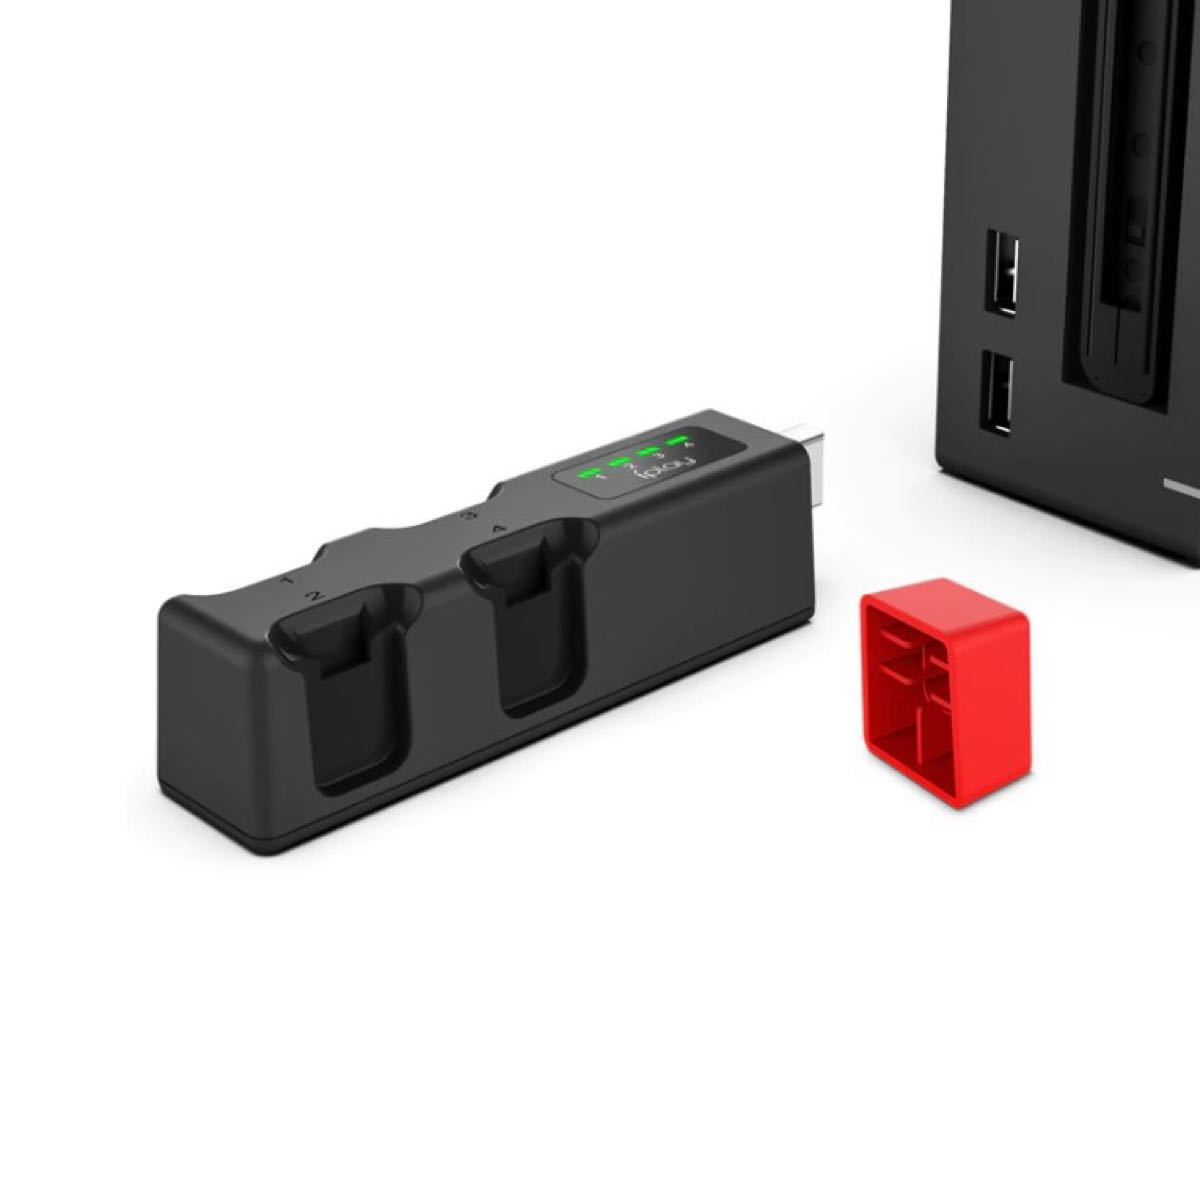 Nintendo Switch スイッチ ジョイコン joy-con 充電スタンド 4台同時充電 任天堂 充電器 ミニ 即日発送